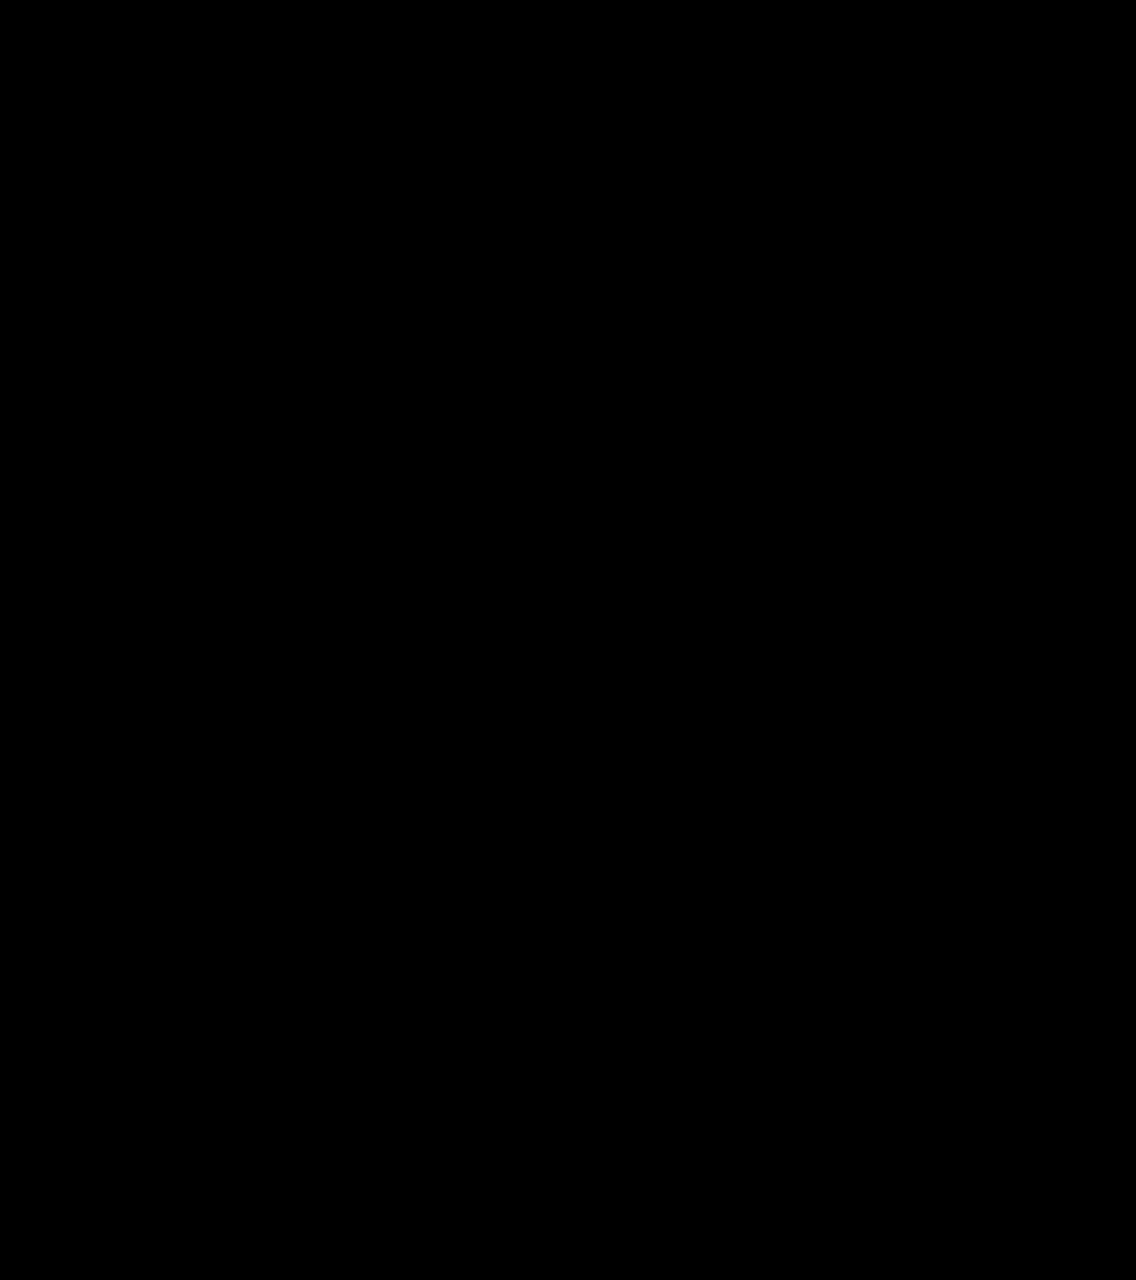 Kostenloses Bild Auf Pixabay Dinosaurier Tyrannosaurus Rex Dinosaur Silhouette Dinosaur Clip Art Animal Silhouette